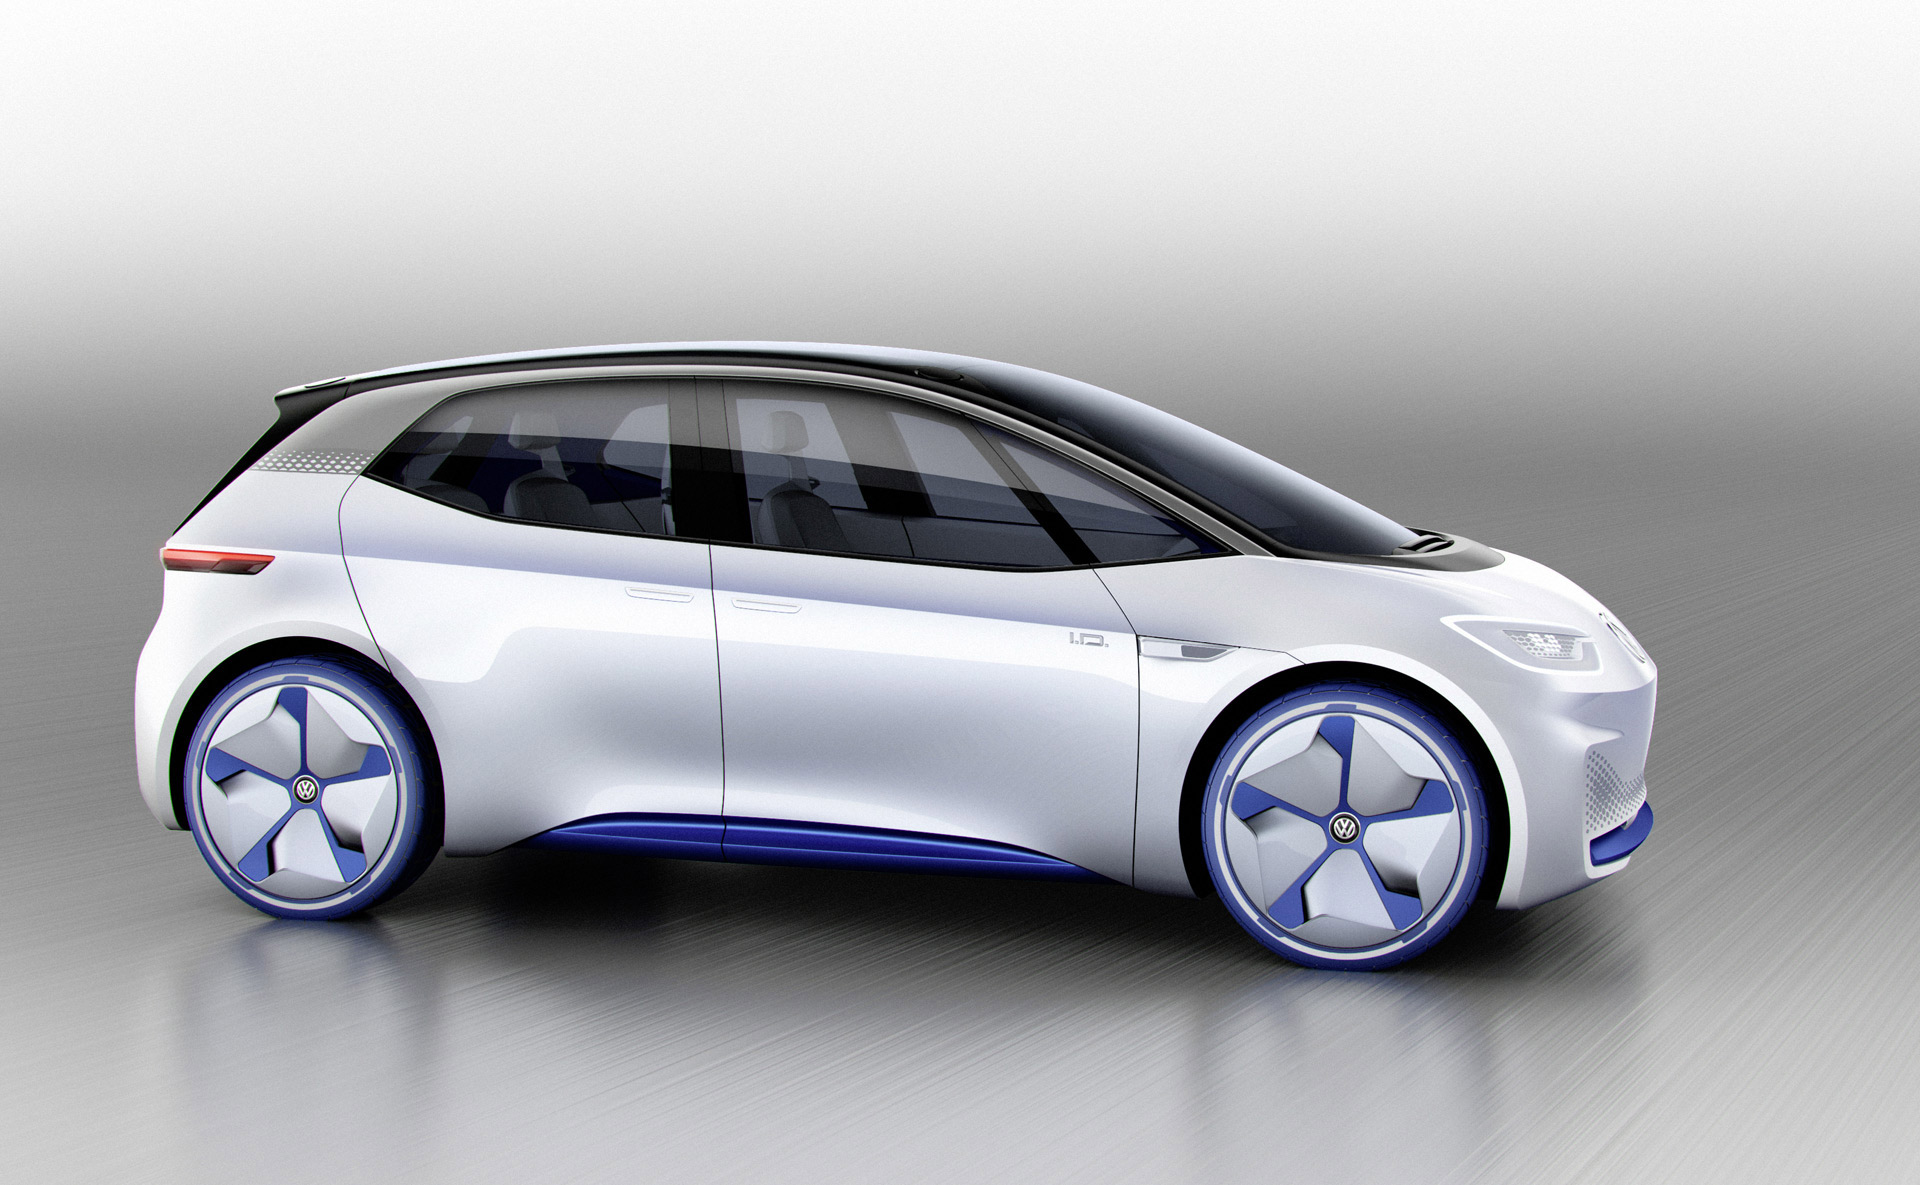 Volkswagen ID: Προπαραγγελίες από το Μαΐο, έναρξη παραγωγής το Σεπτέμβριο